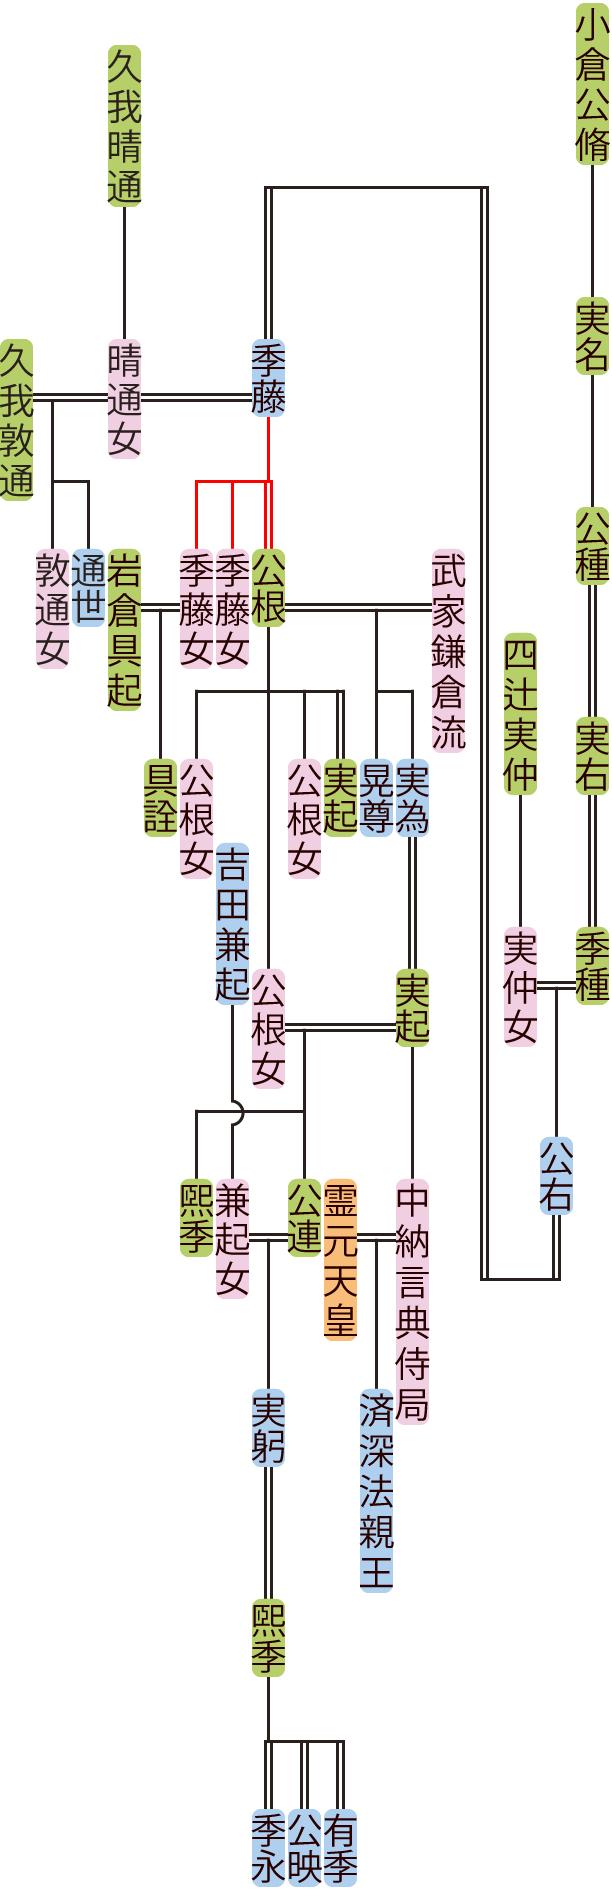 小倉公種~実躬の系図